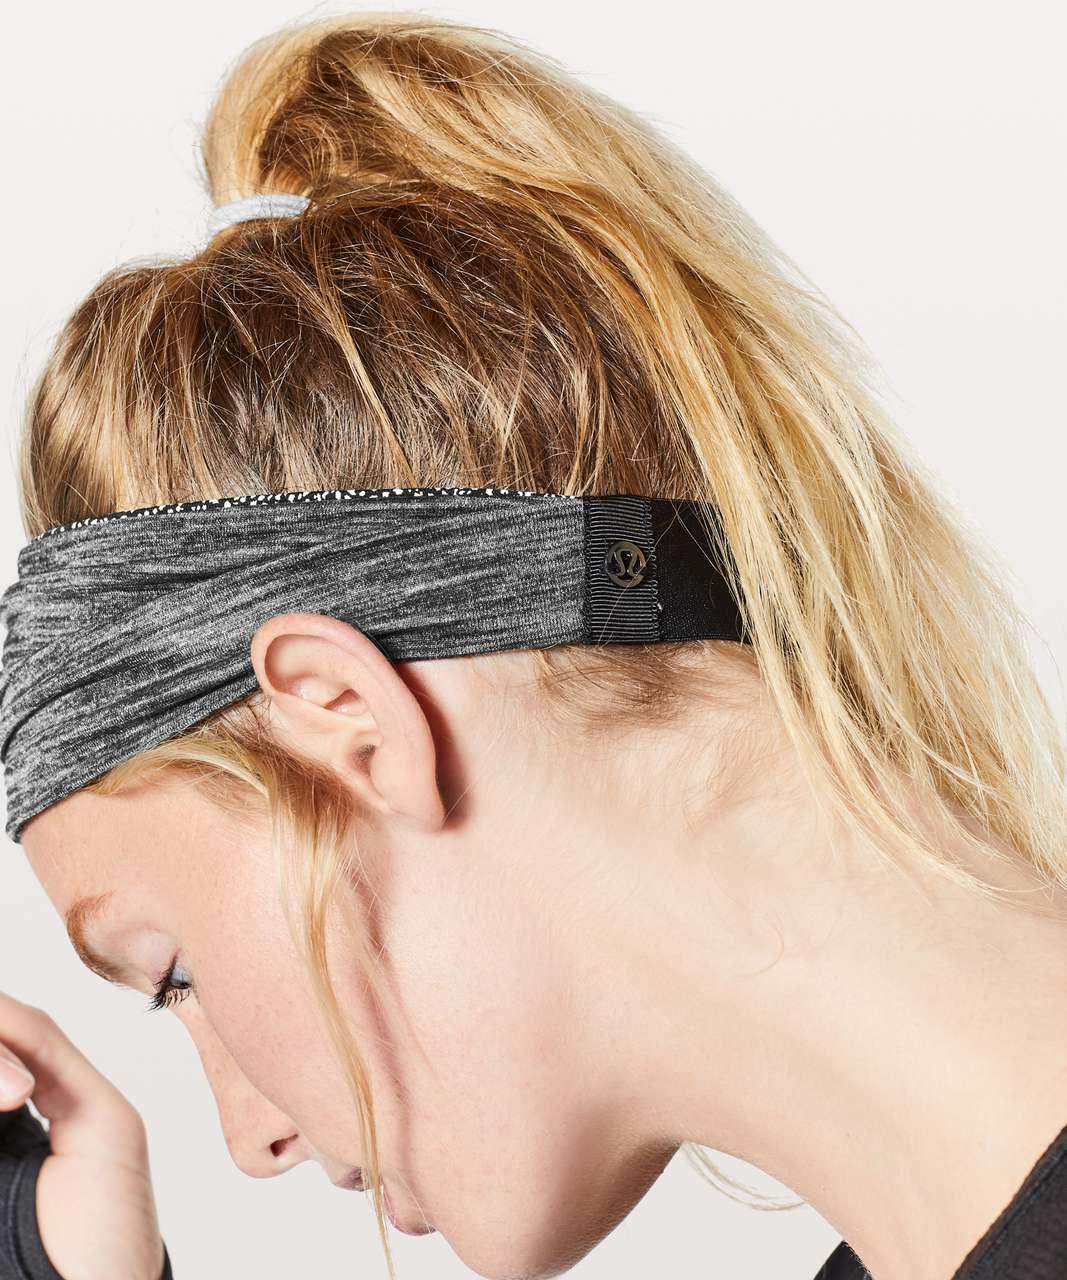 Lululemon Fringe Fighter Headband - Chakra Print Alpine White Black / Heathered Black